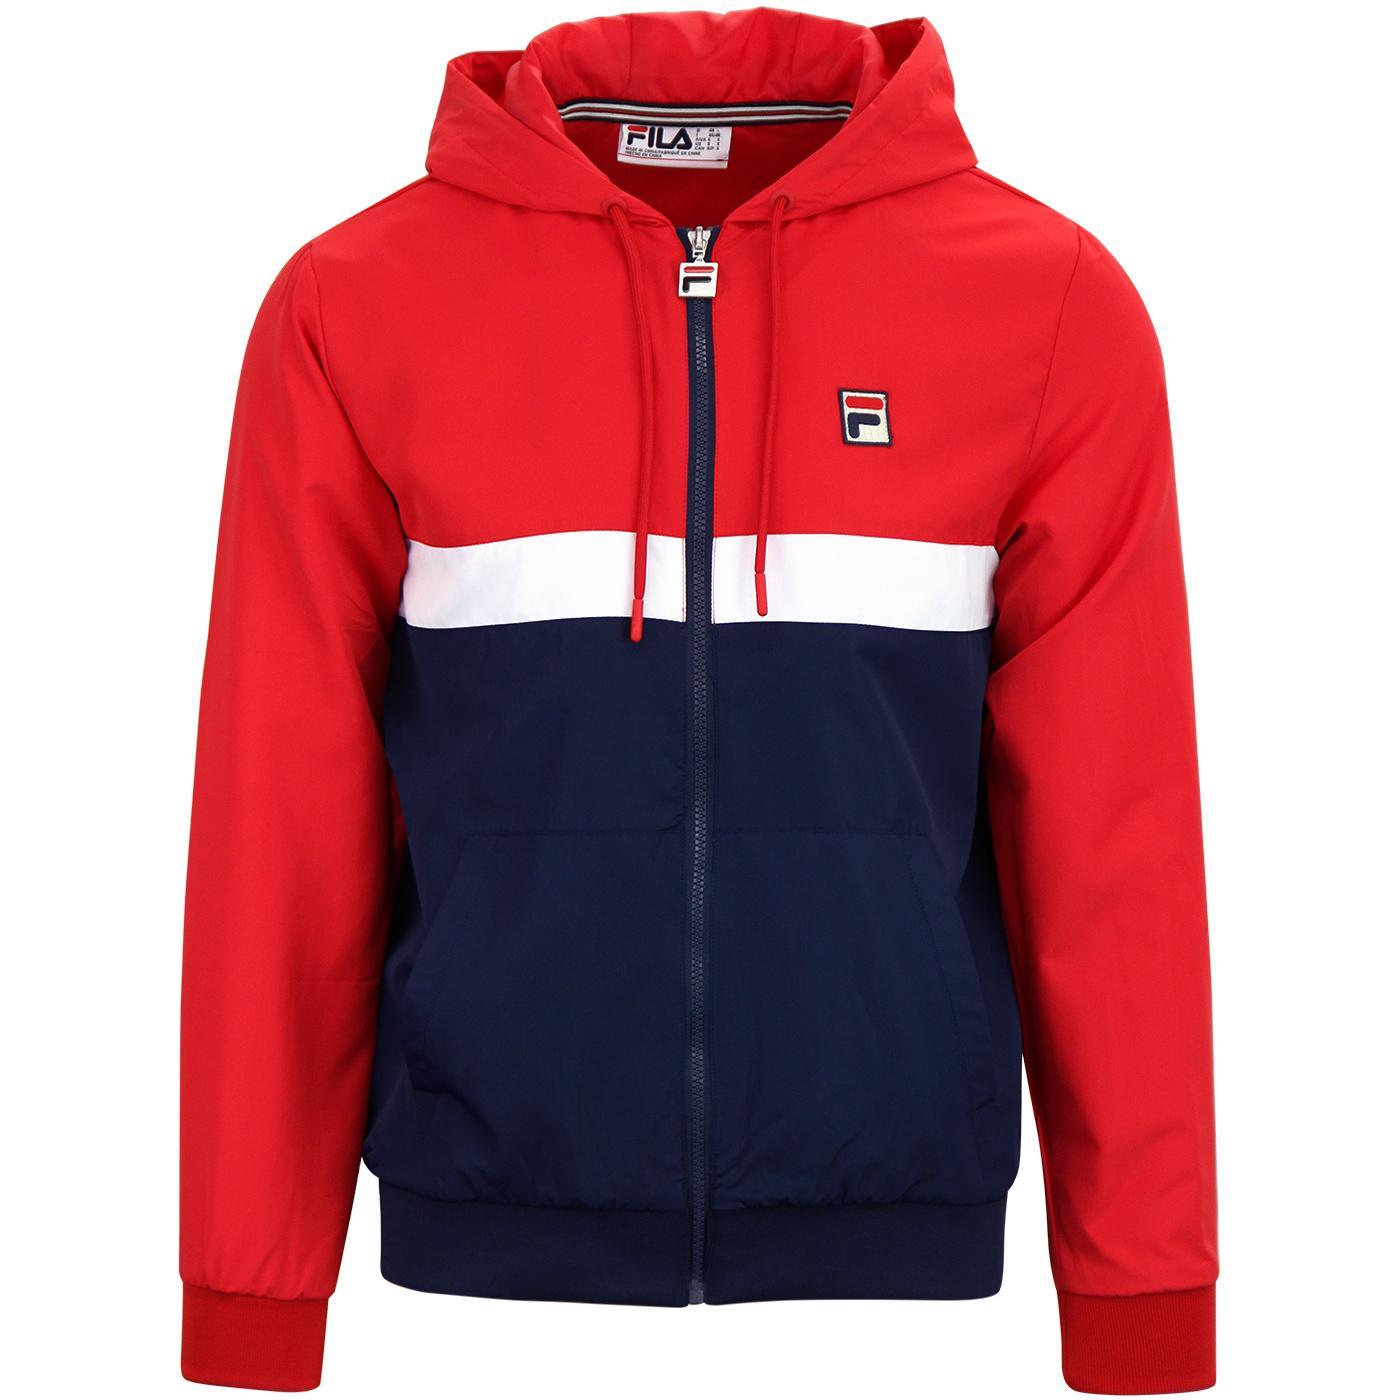 Ambrose FILA VINTAGE Retro 70s Colour Block Jacket